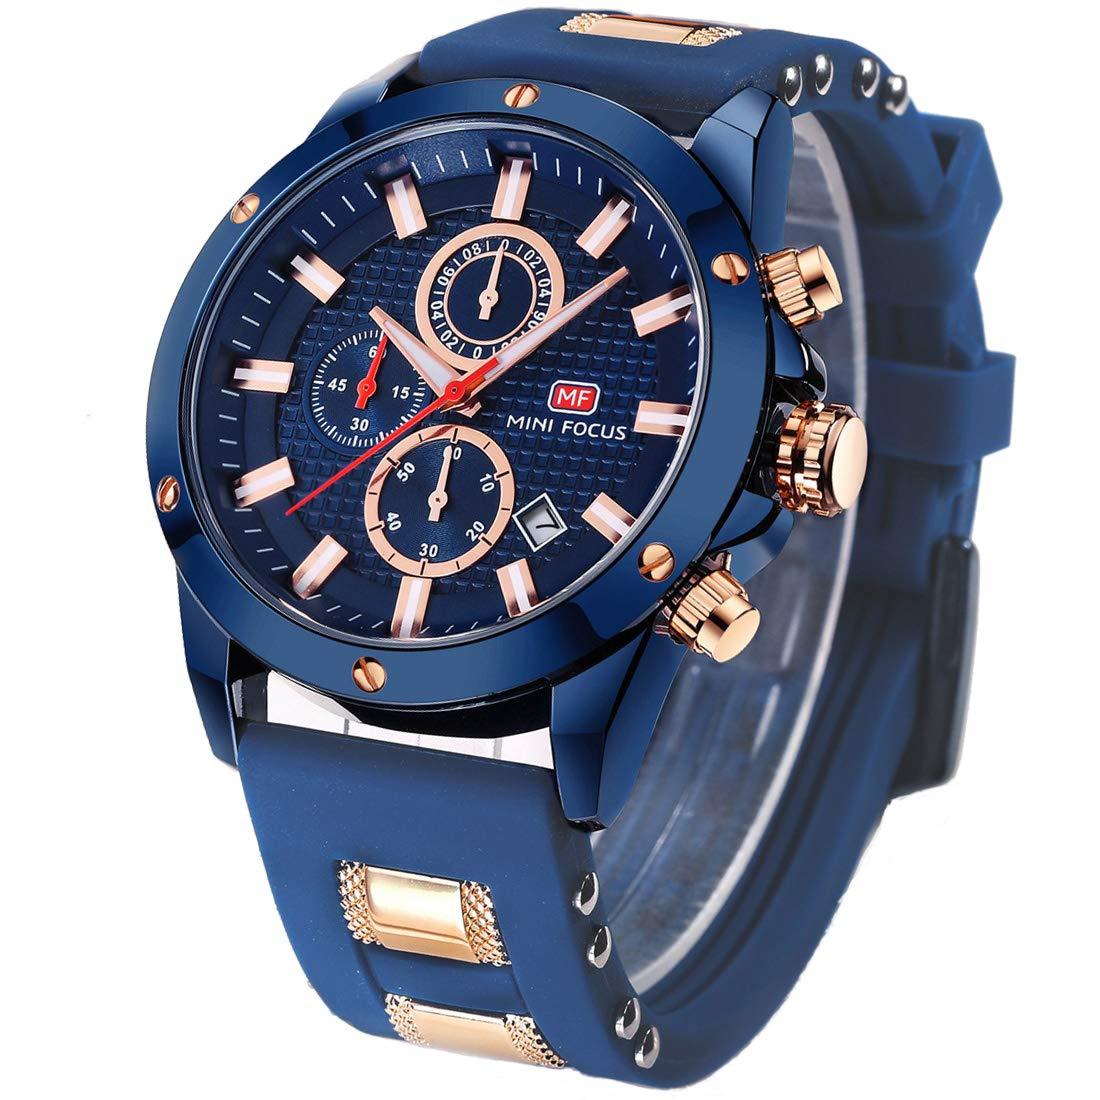 Men's Business Quartz Watches, Waterproof Silicone Band Chronograph Sport Wrist Watch (Blue)